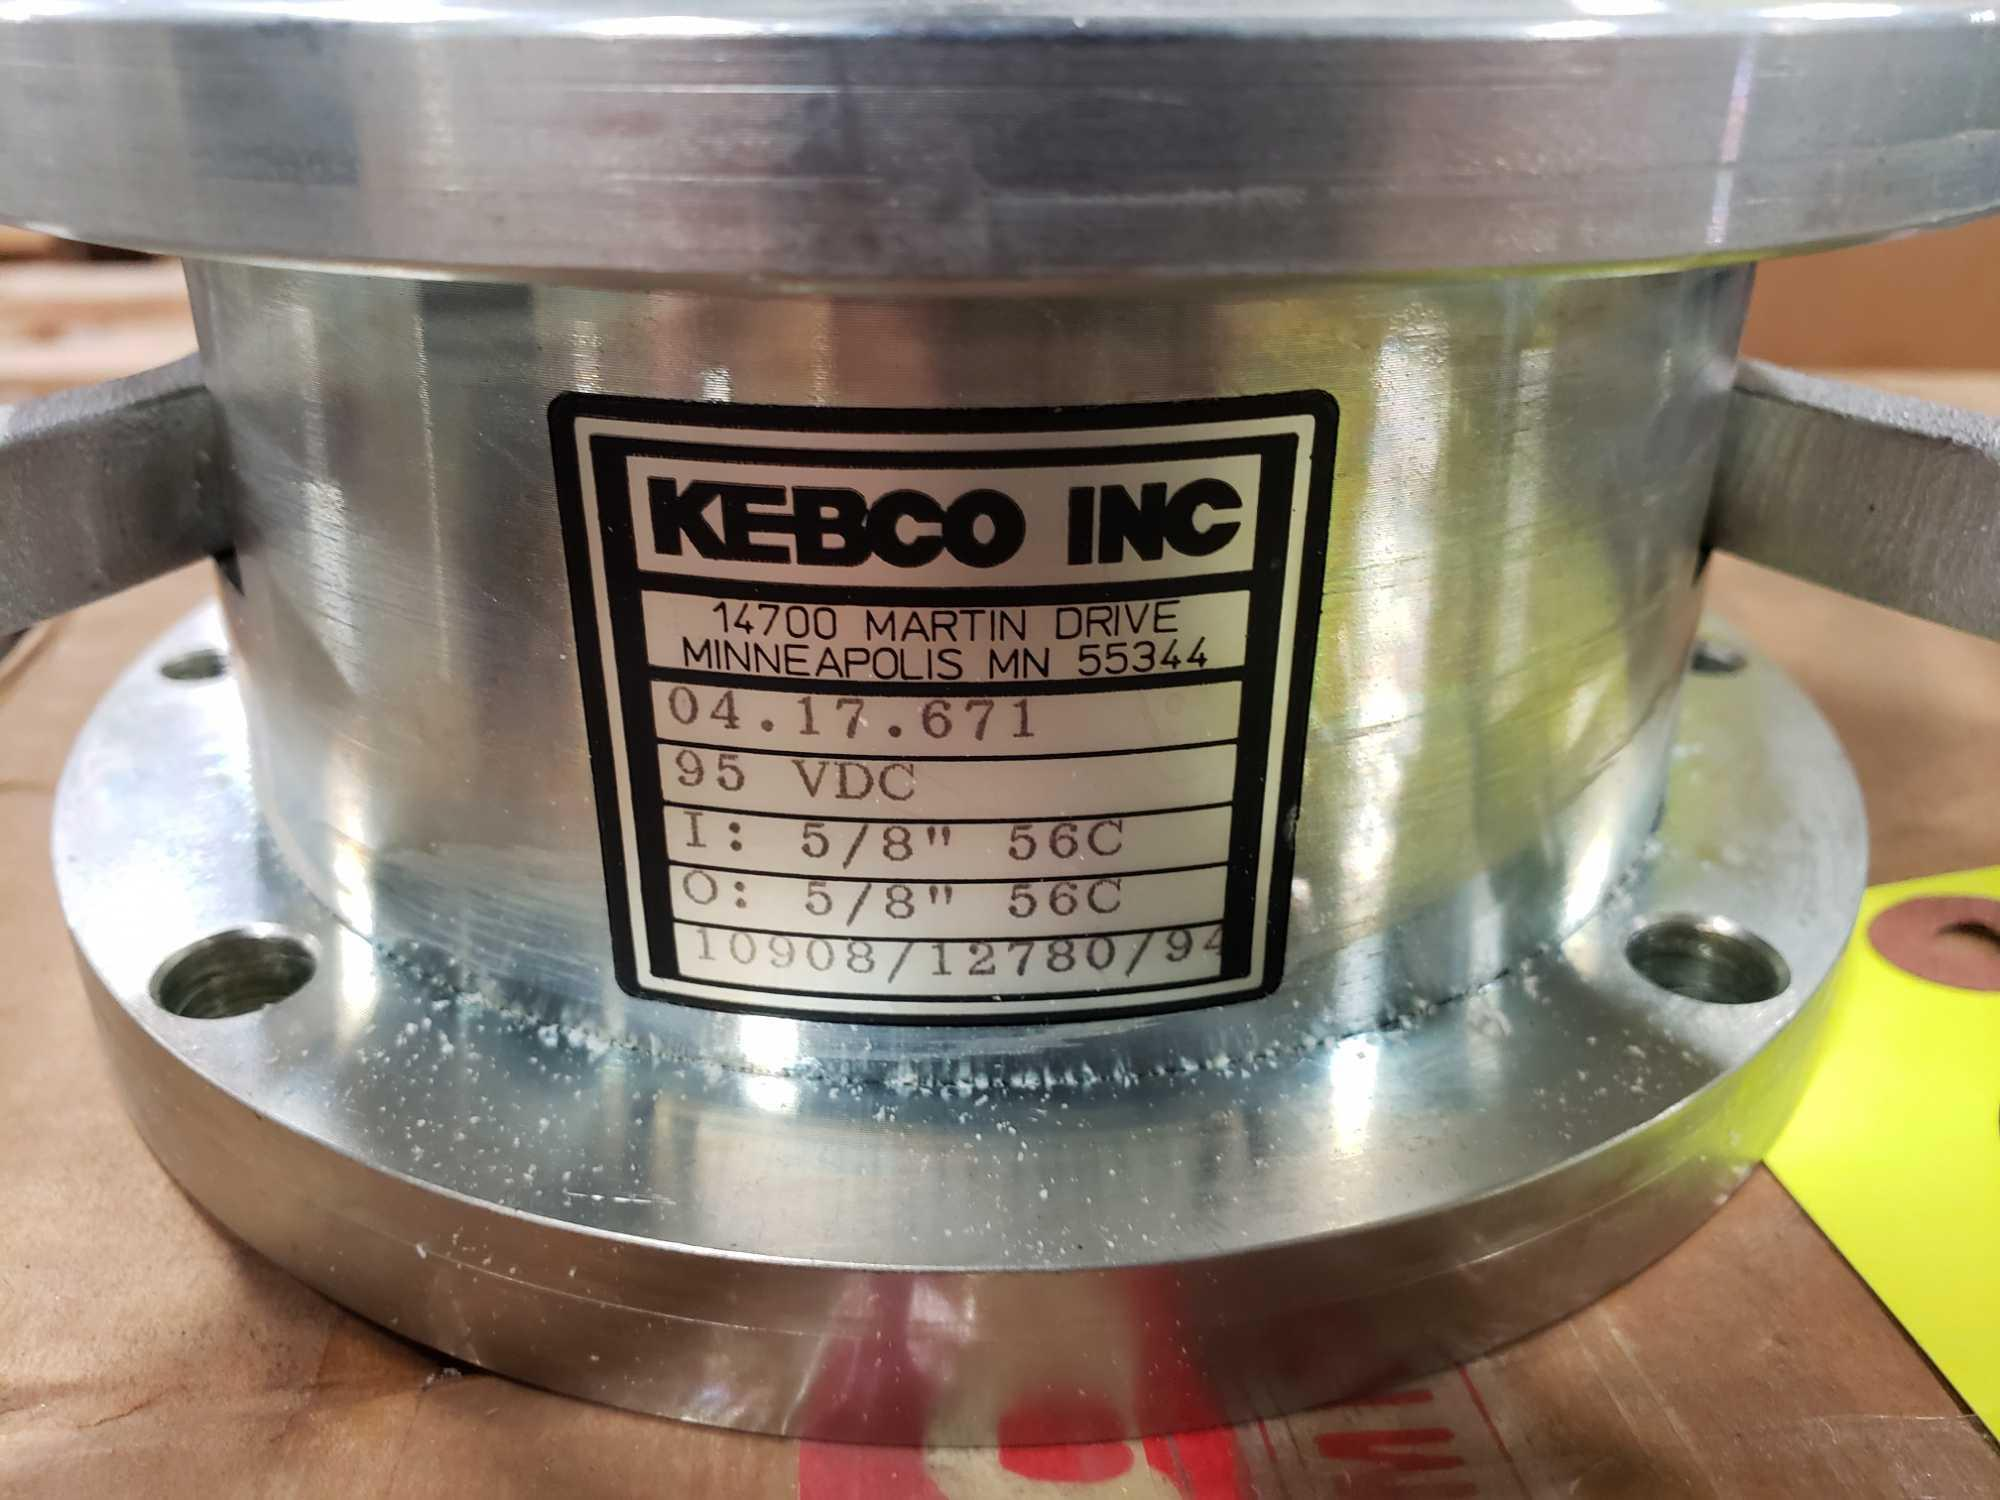 Kebco brake model 04.17.671, 95vdc, 56c output, 56c input. New in box. - Image 2 of 3